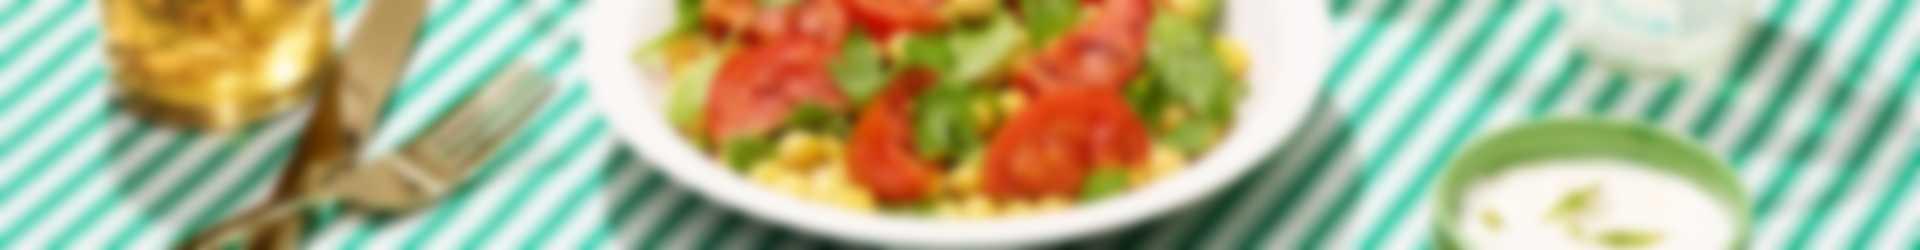 gegrilde-tomaten